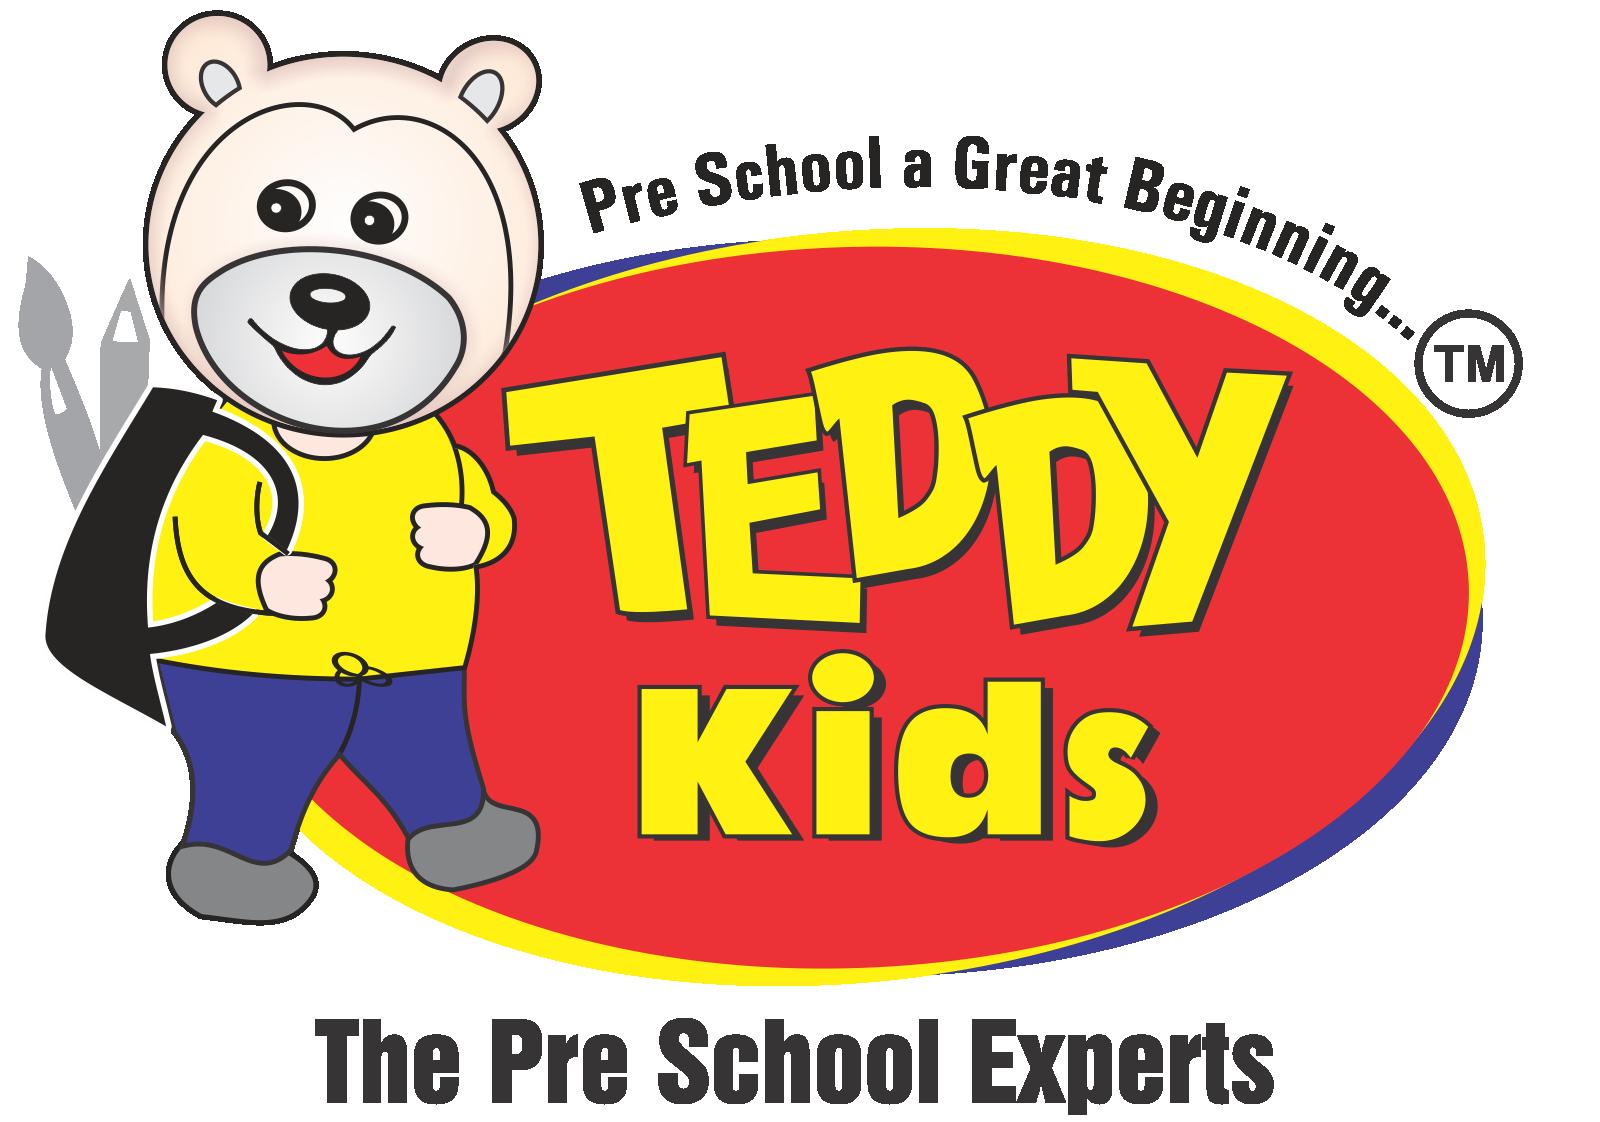 Pre school children clipart graphic free library Jabalpur Play School - Teddy Kids Pre School graphic free library